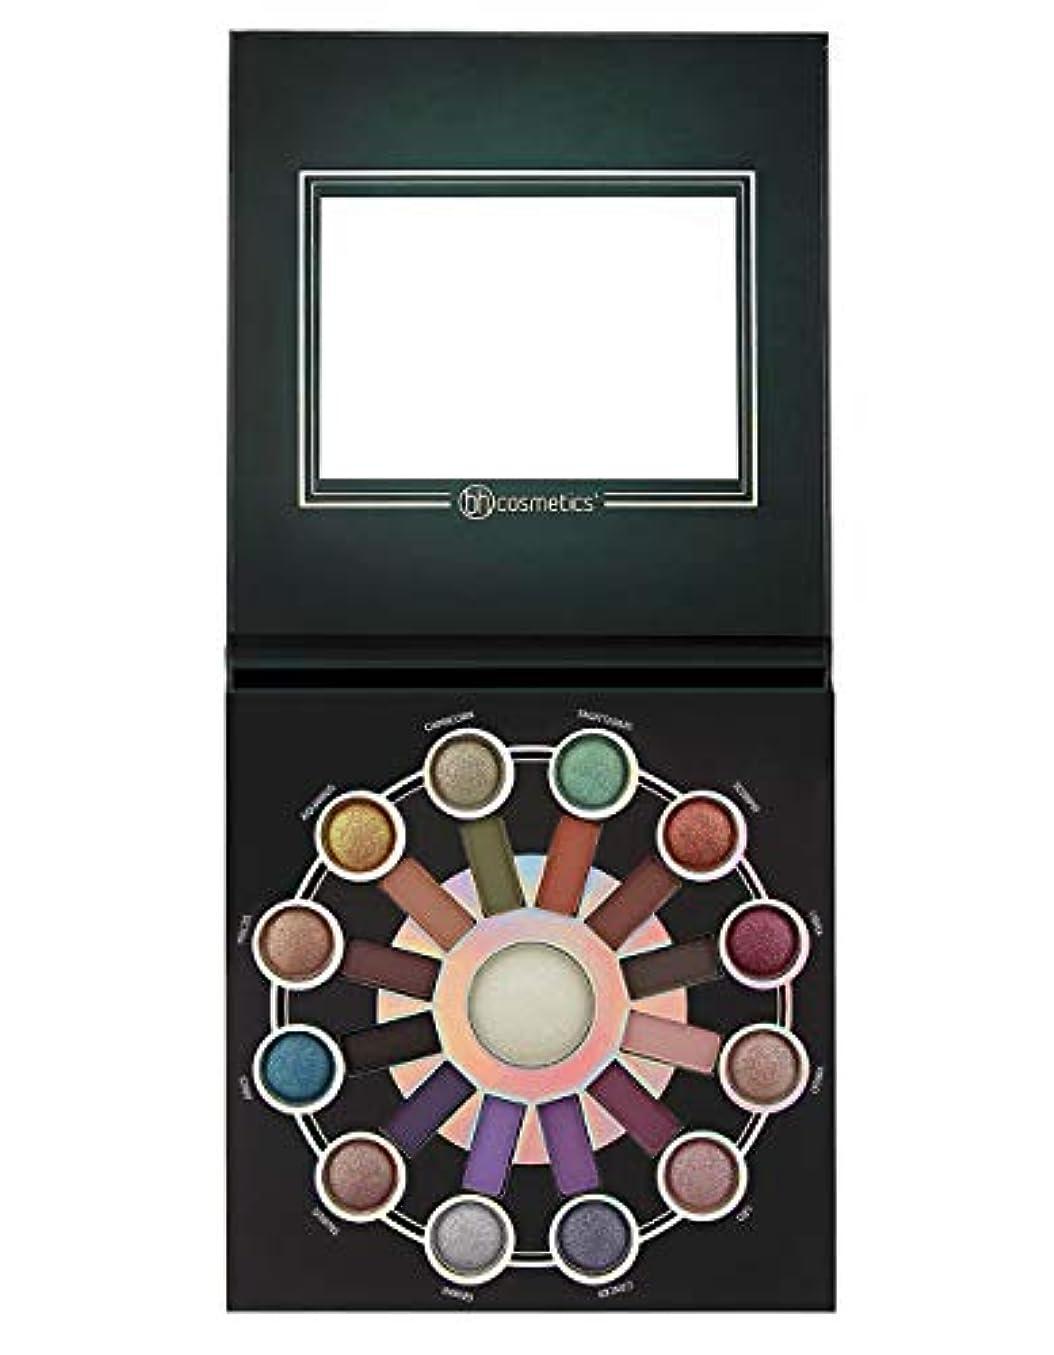 BH Cosmetics Zodiac - 25 Colour Eyeshadow & Highlighter Palette